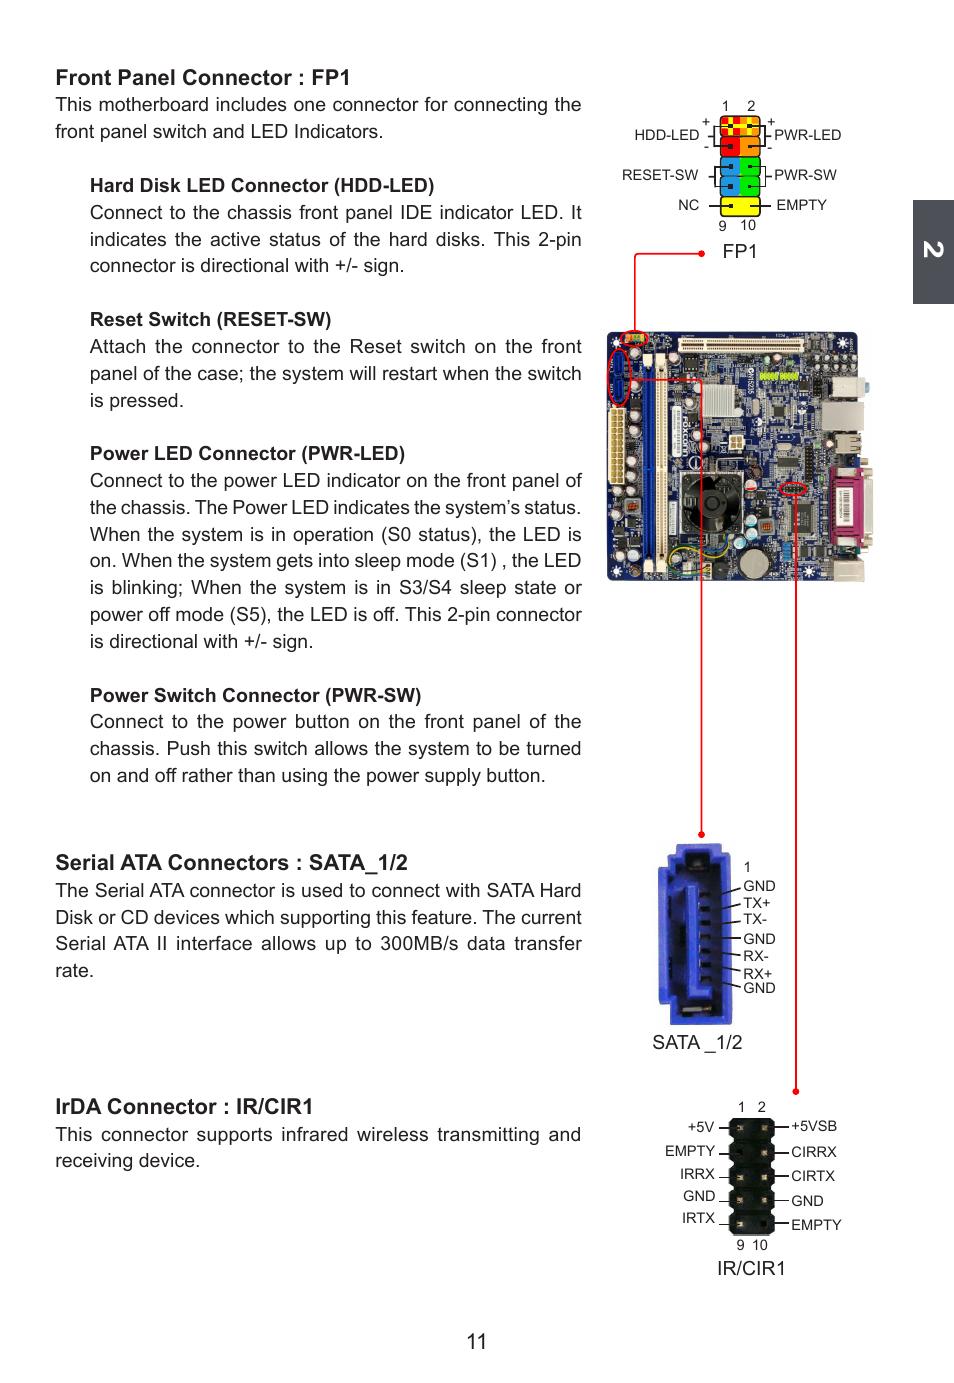 Front panel connector : fp1, Serial ata connectors : sata_1